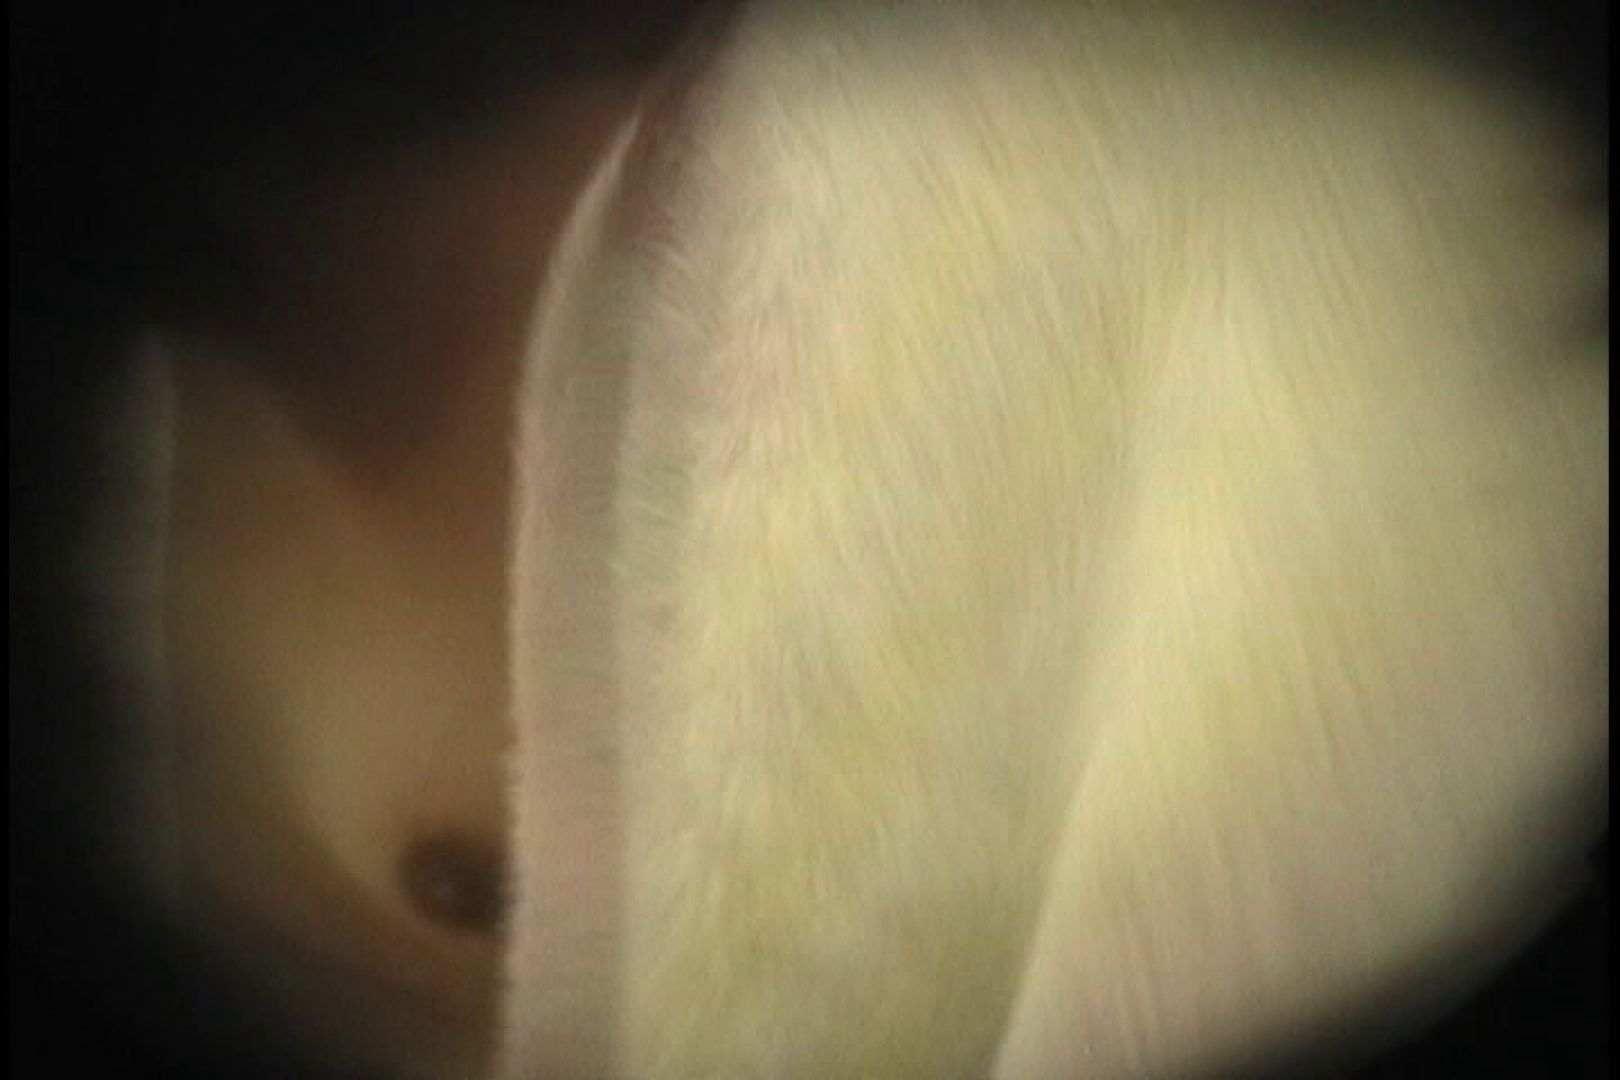 No.32 脇とVラインの処理が甘い貧乳ギャル、タンポンの紐がぶらぶら シャワー室 | 乙女H映像  88画像 40